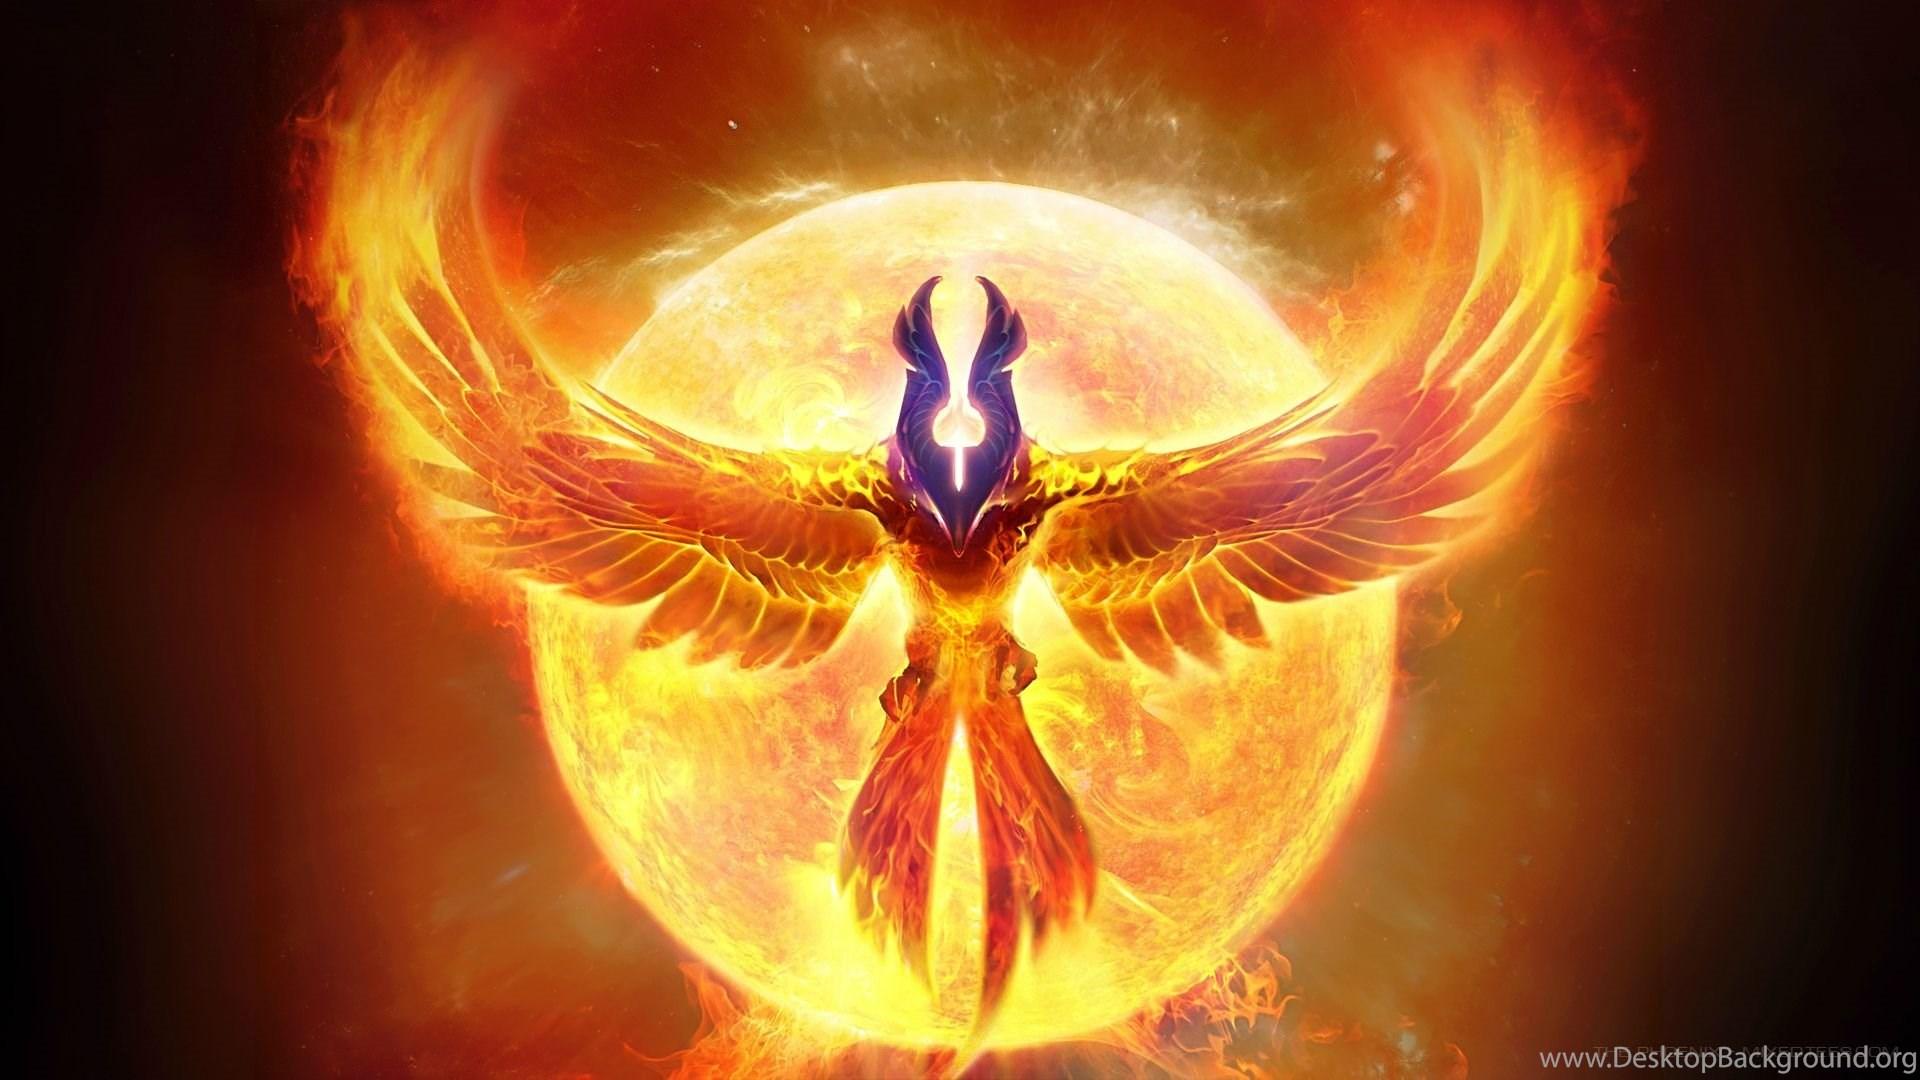 The phoenix hd wallpapers imgur desktop background - Fenix bird hd images ...